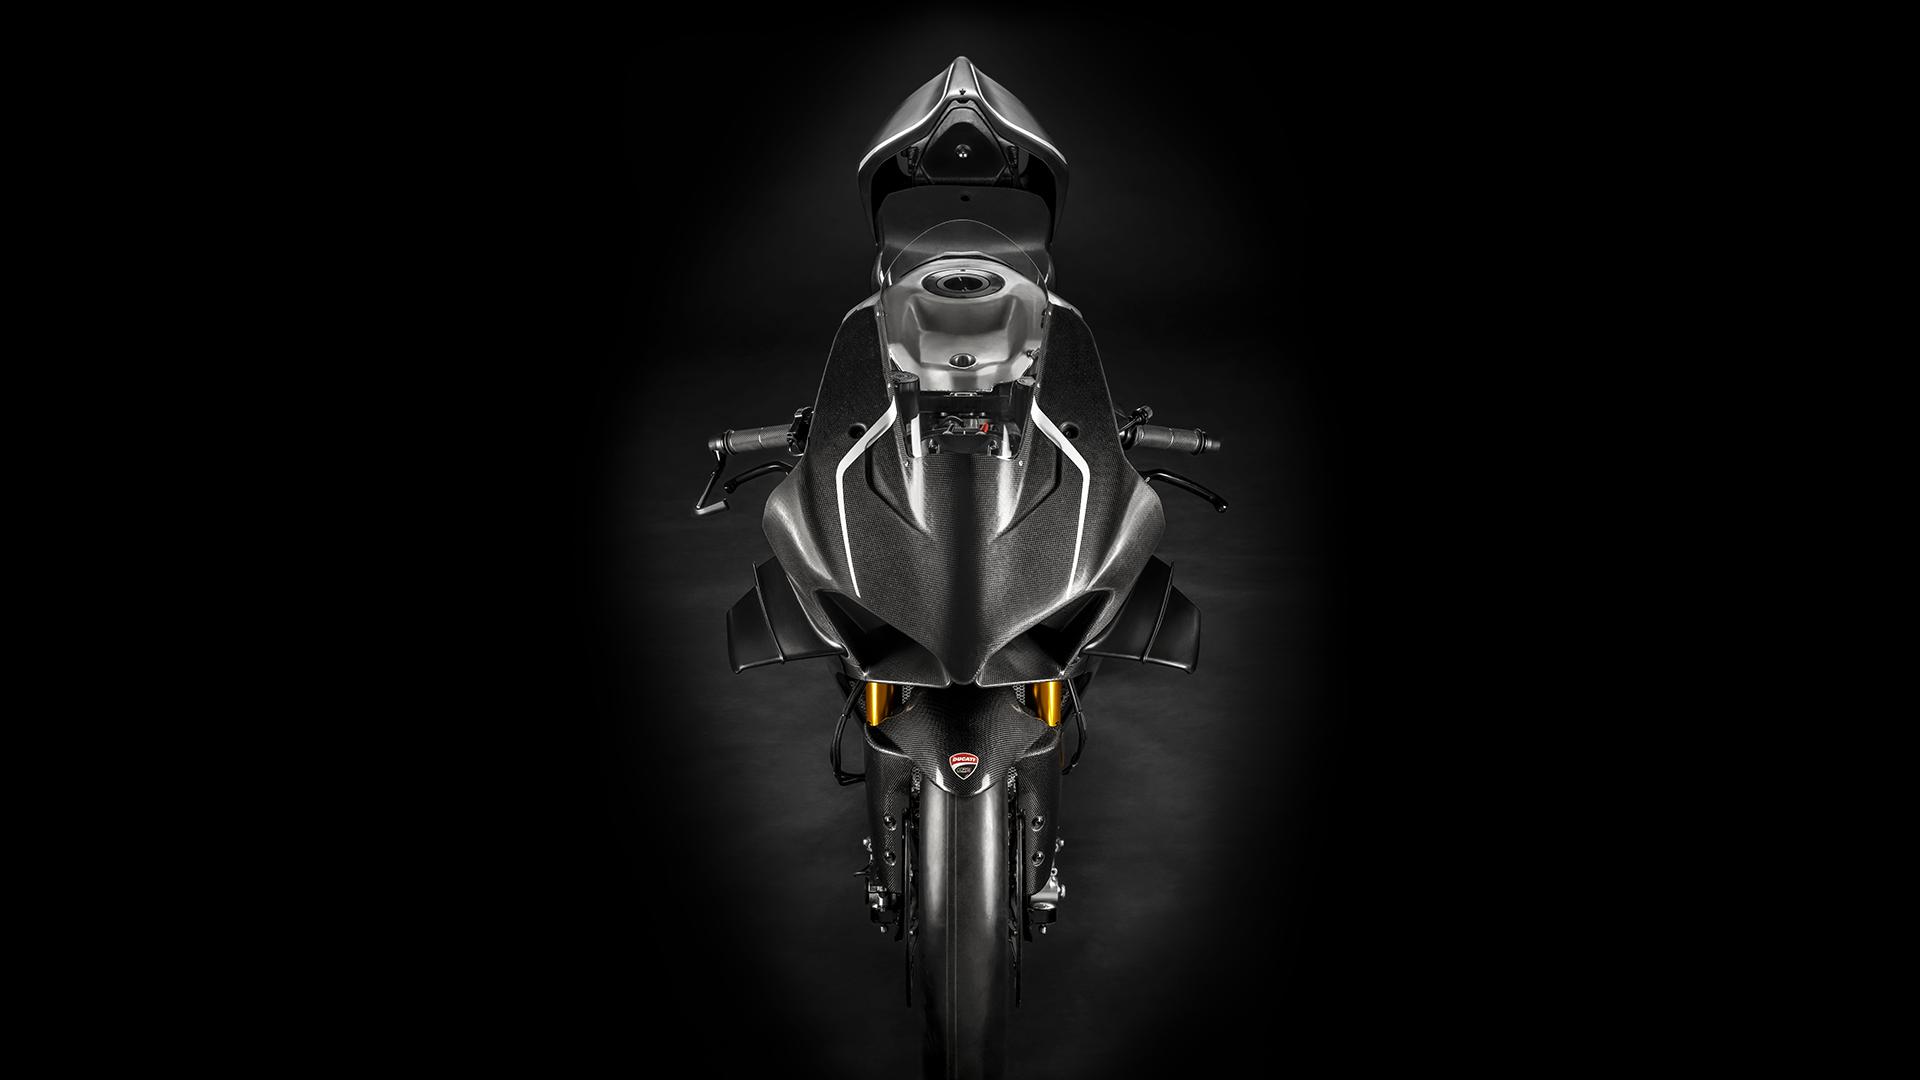 2020 Celtic HSBK Racing Ducati V4R Shakedown